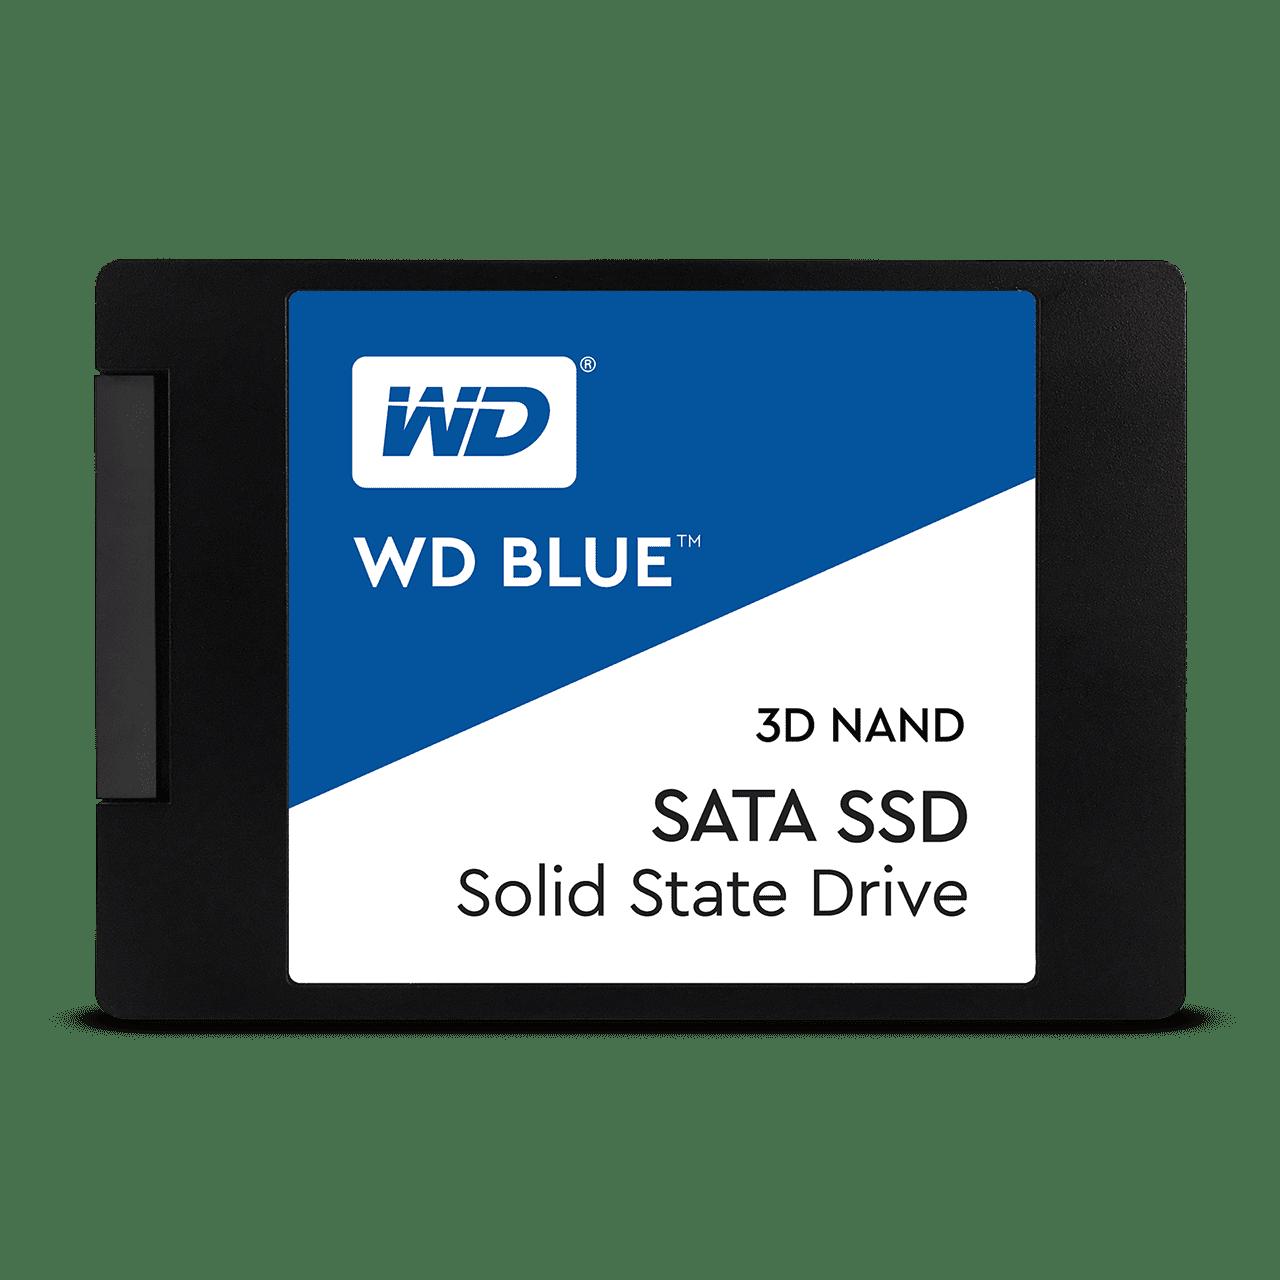 EDU email: Western Digital WD Blue SSD 1TB $74.79, 2TB $152.99 +TAX +FREESHIP